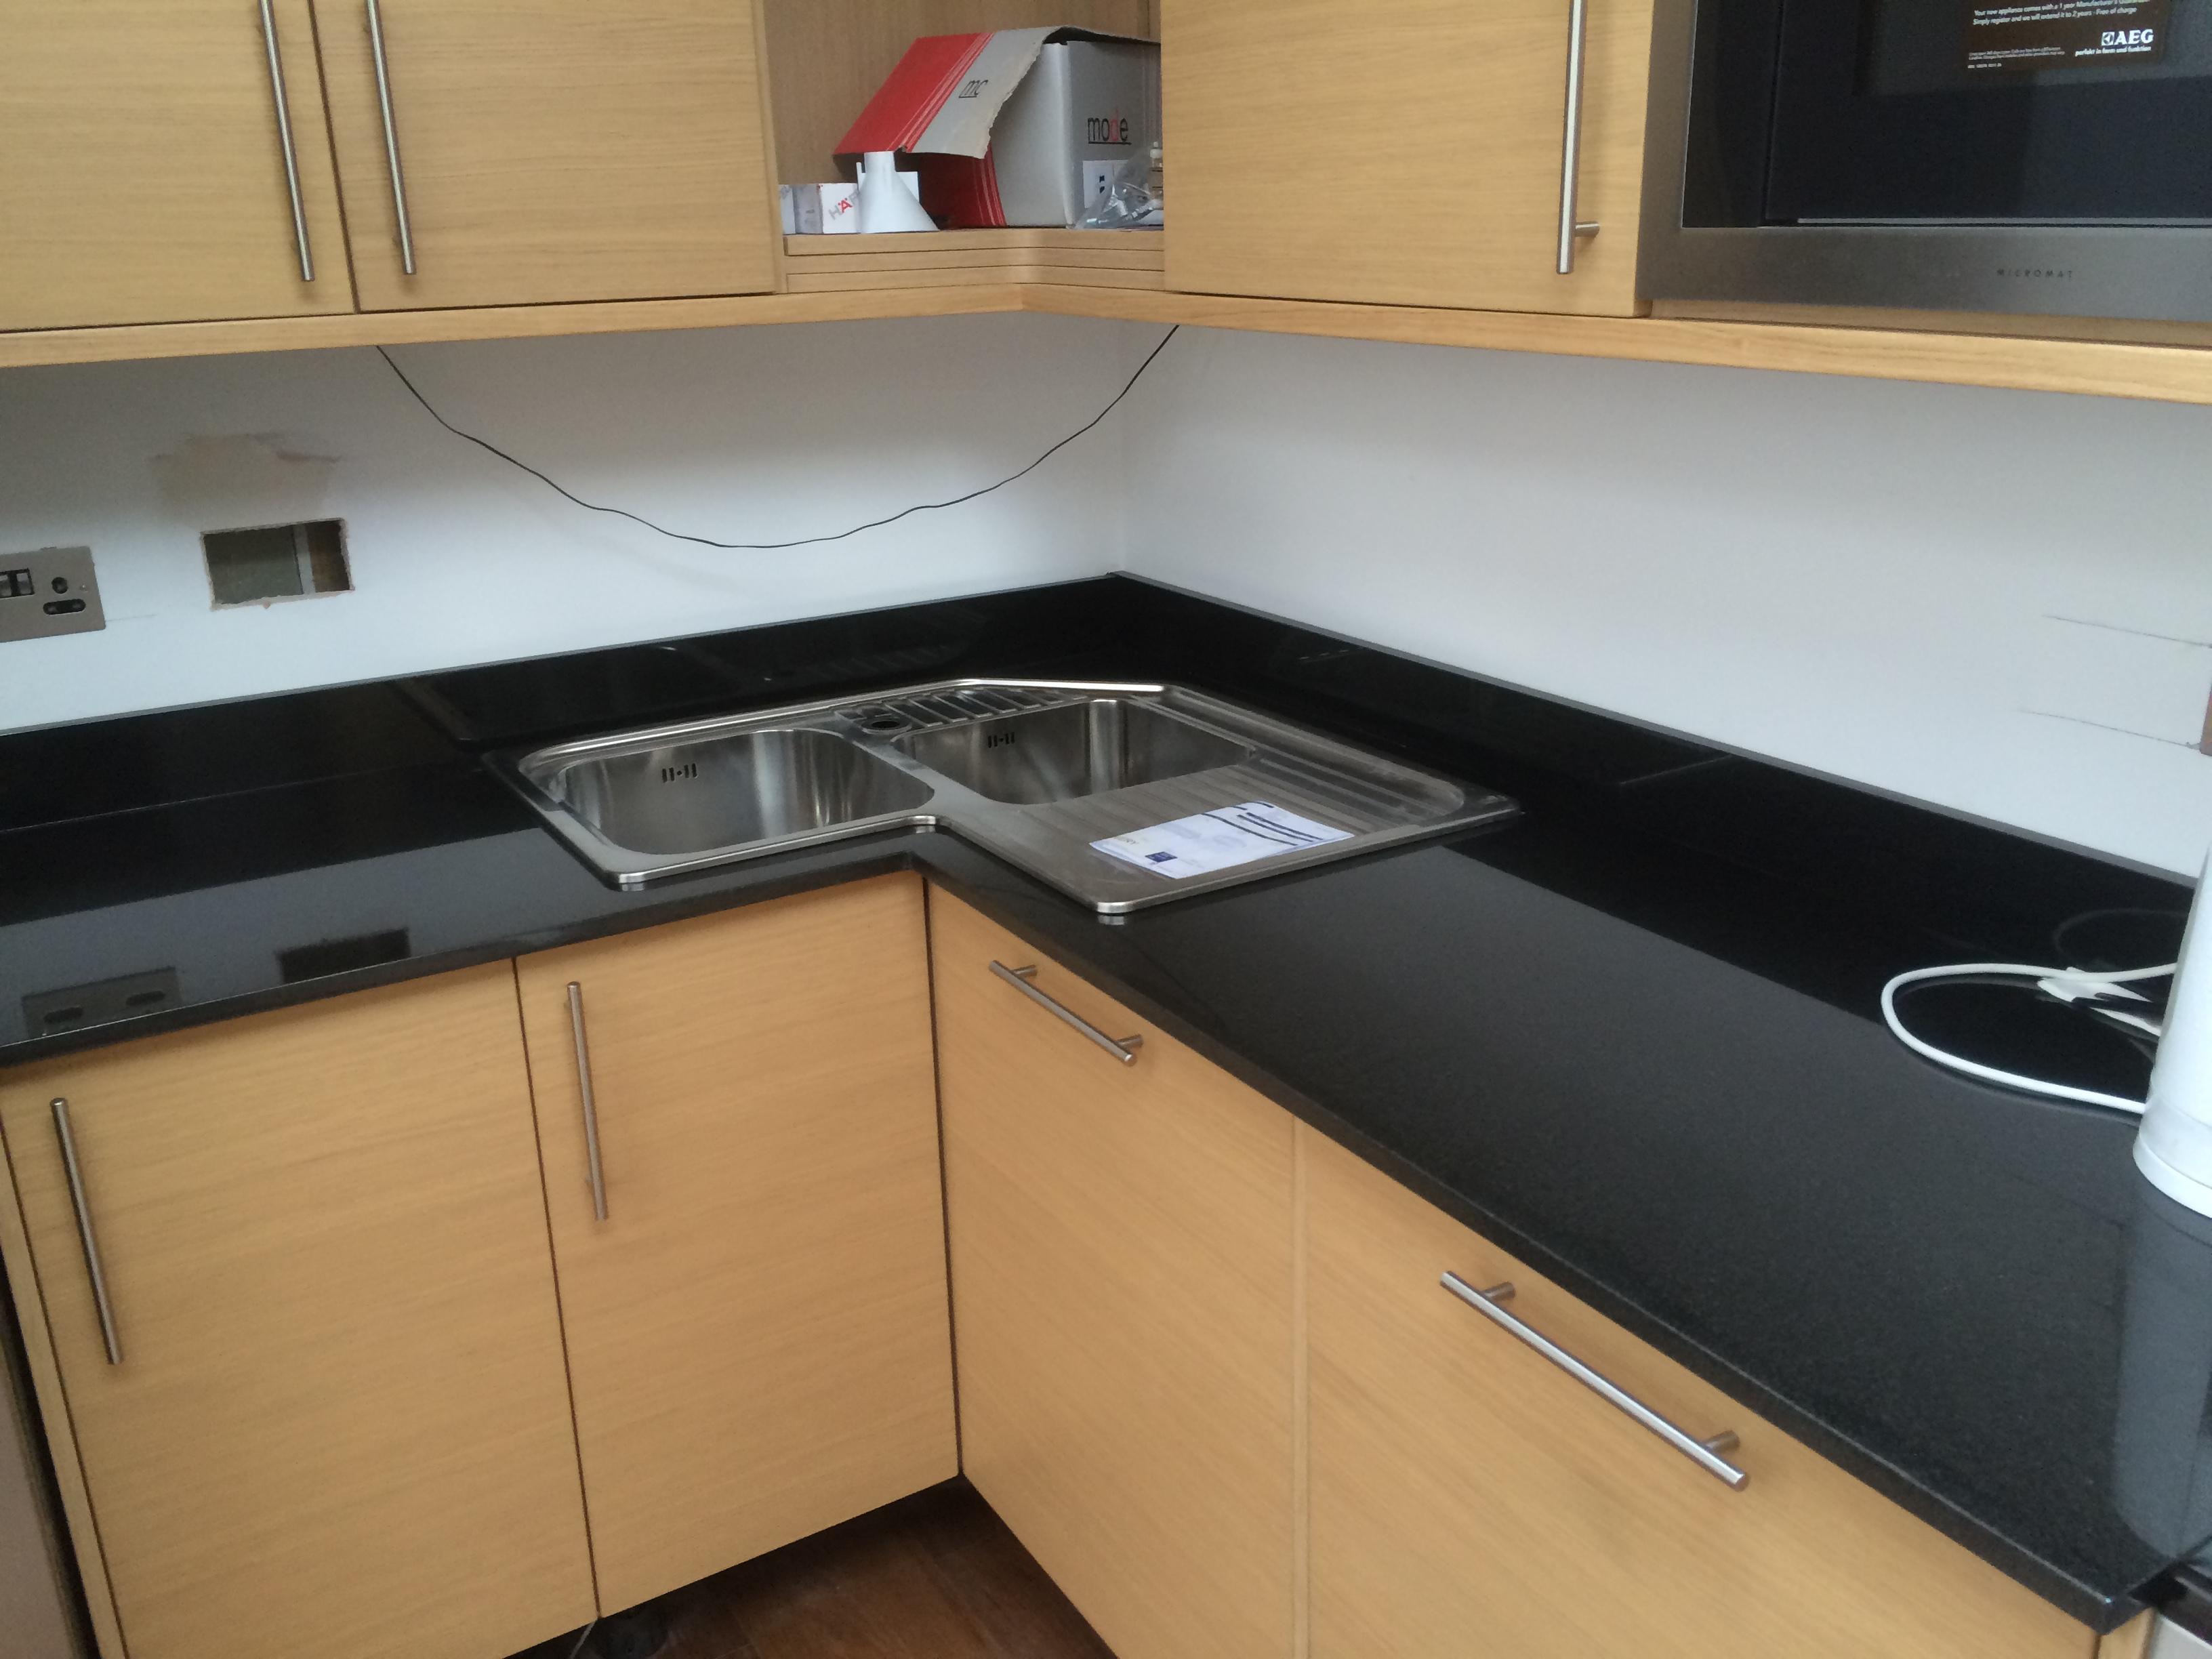 Black Granite kitchen worktop in London (2)